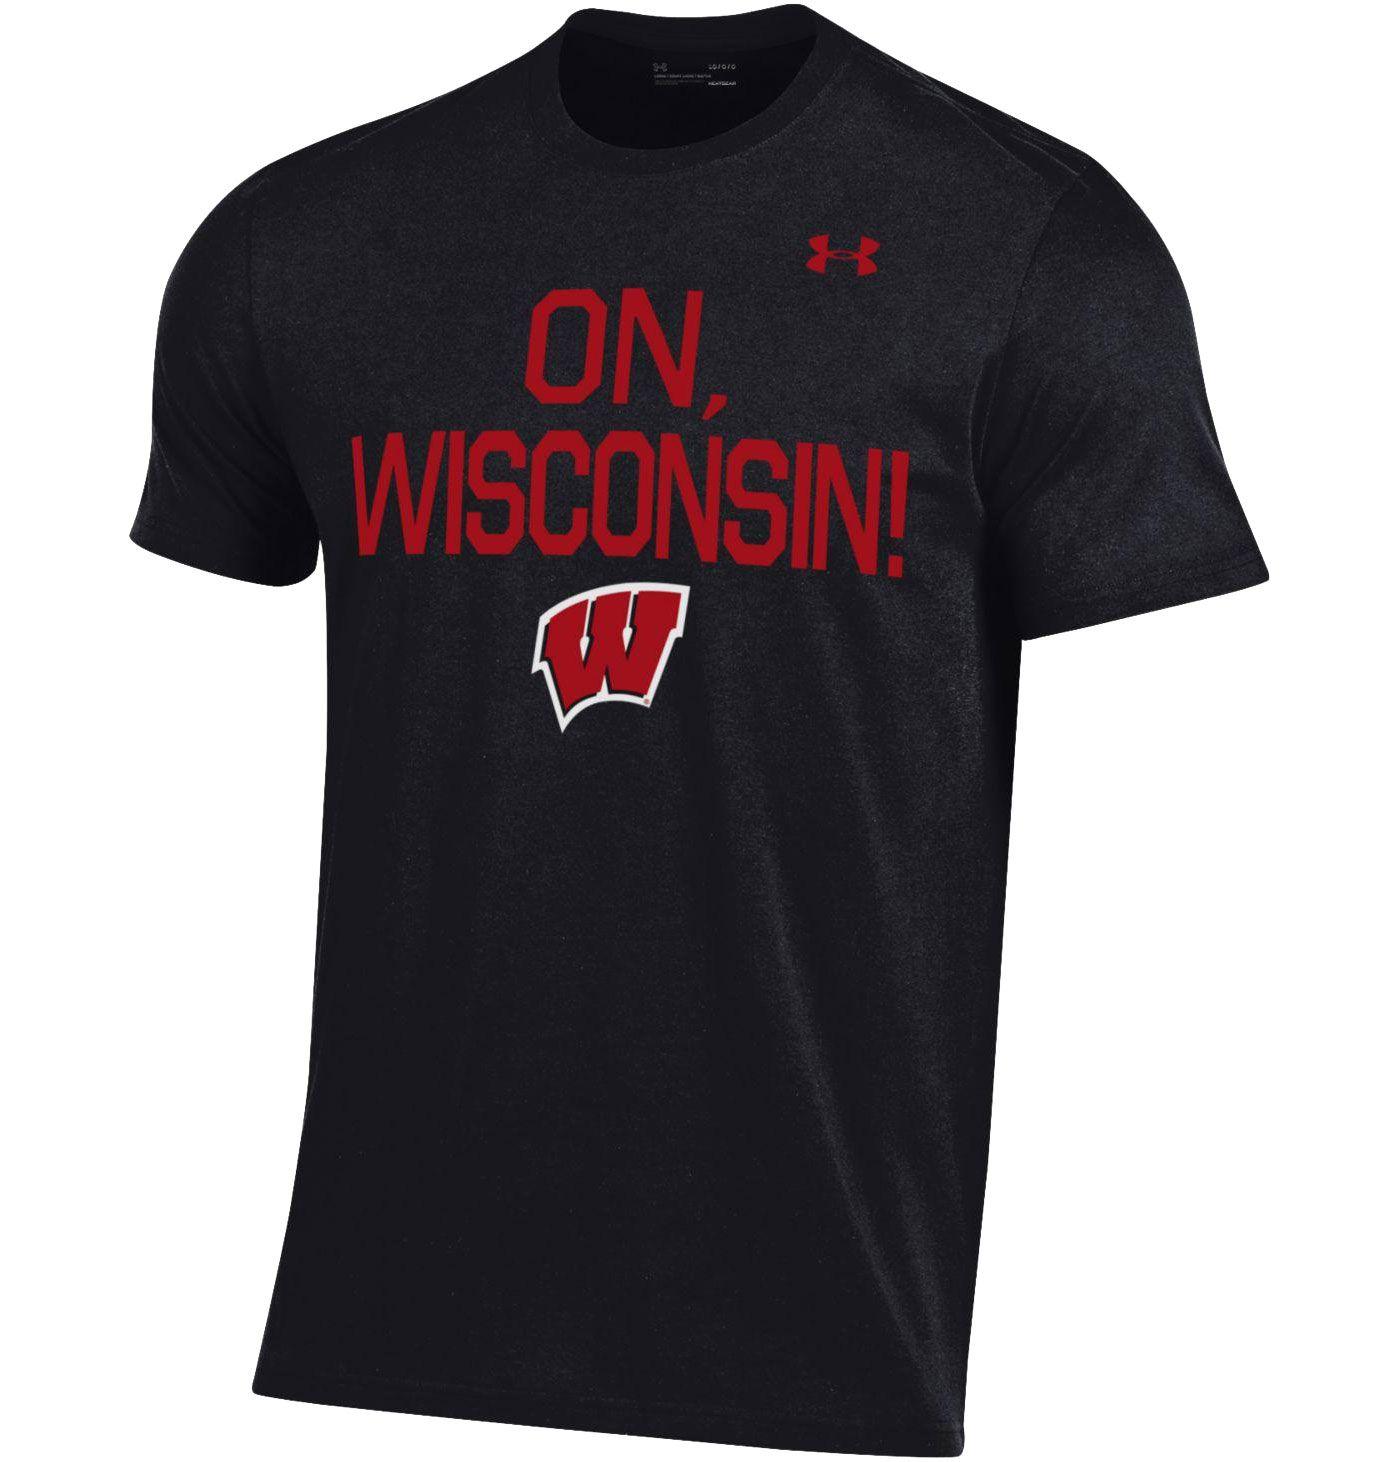 Under Armour Men's Wisconsin Badgers Black Performance Cotton T-Shirt